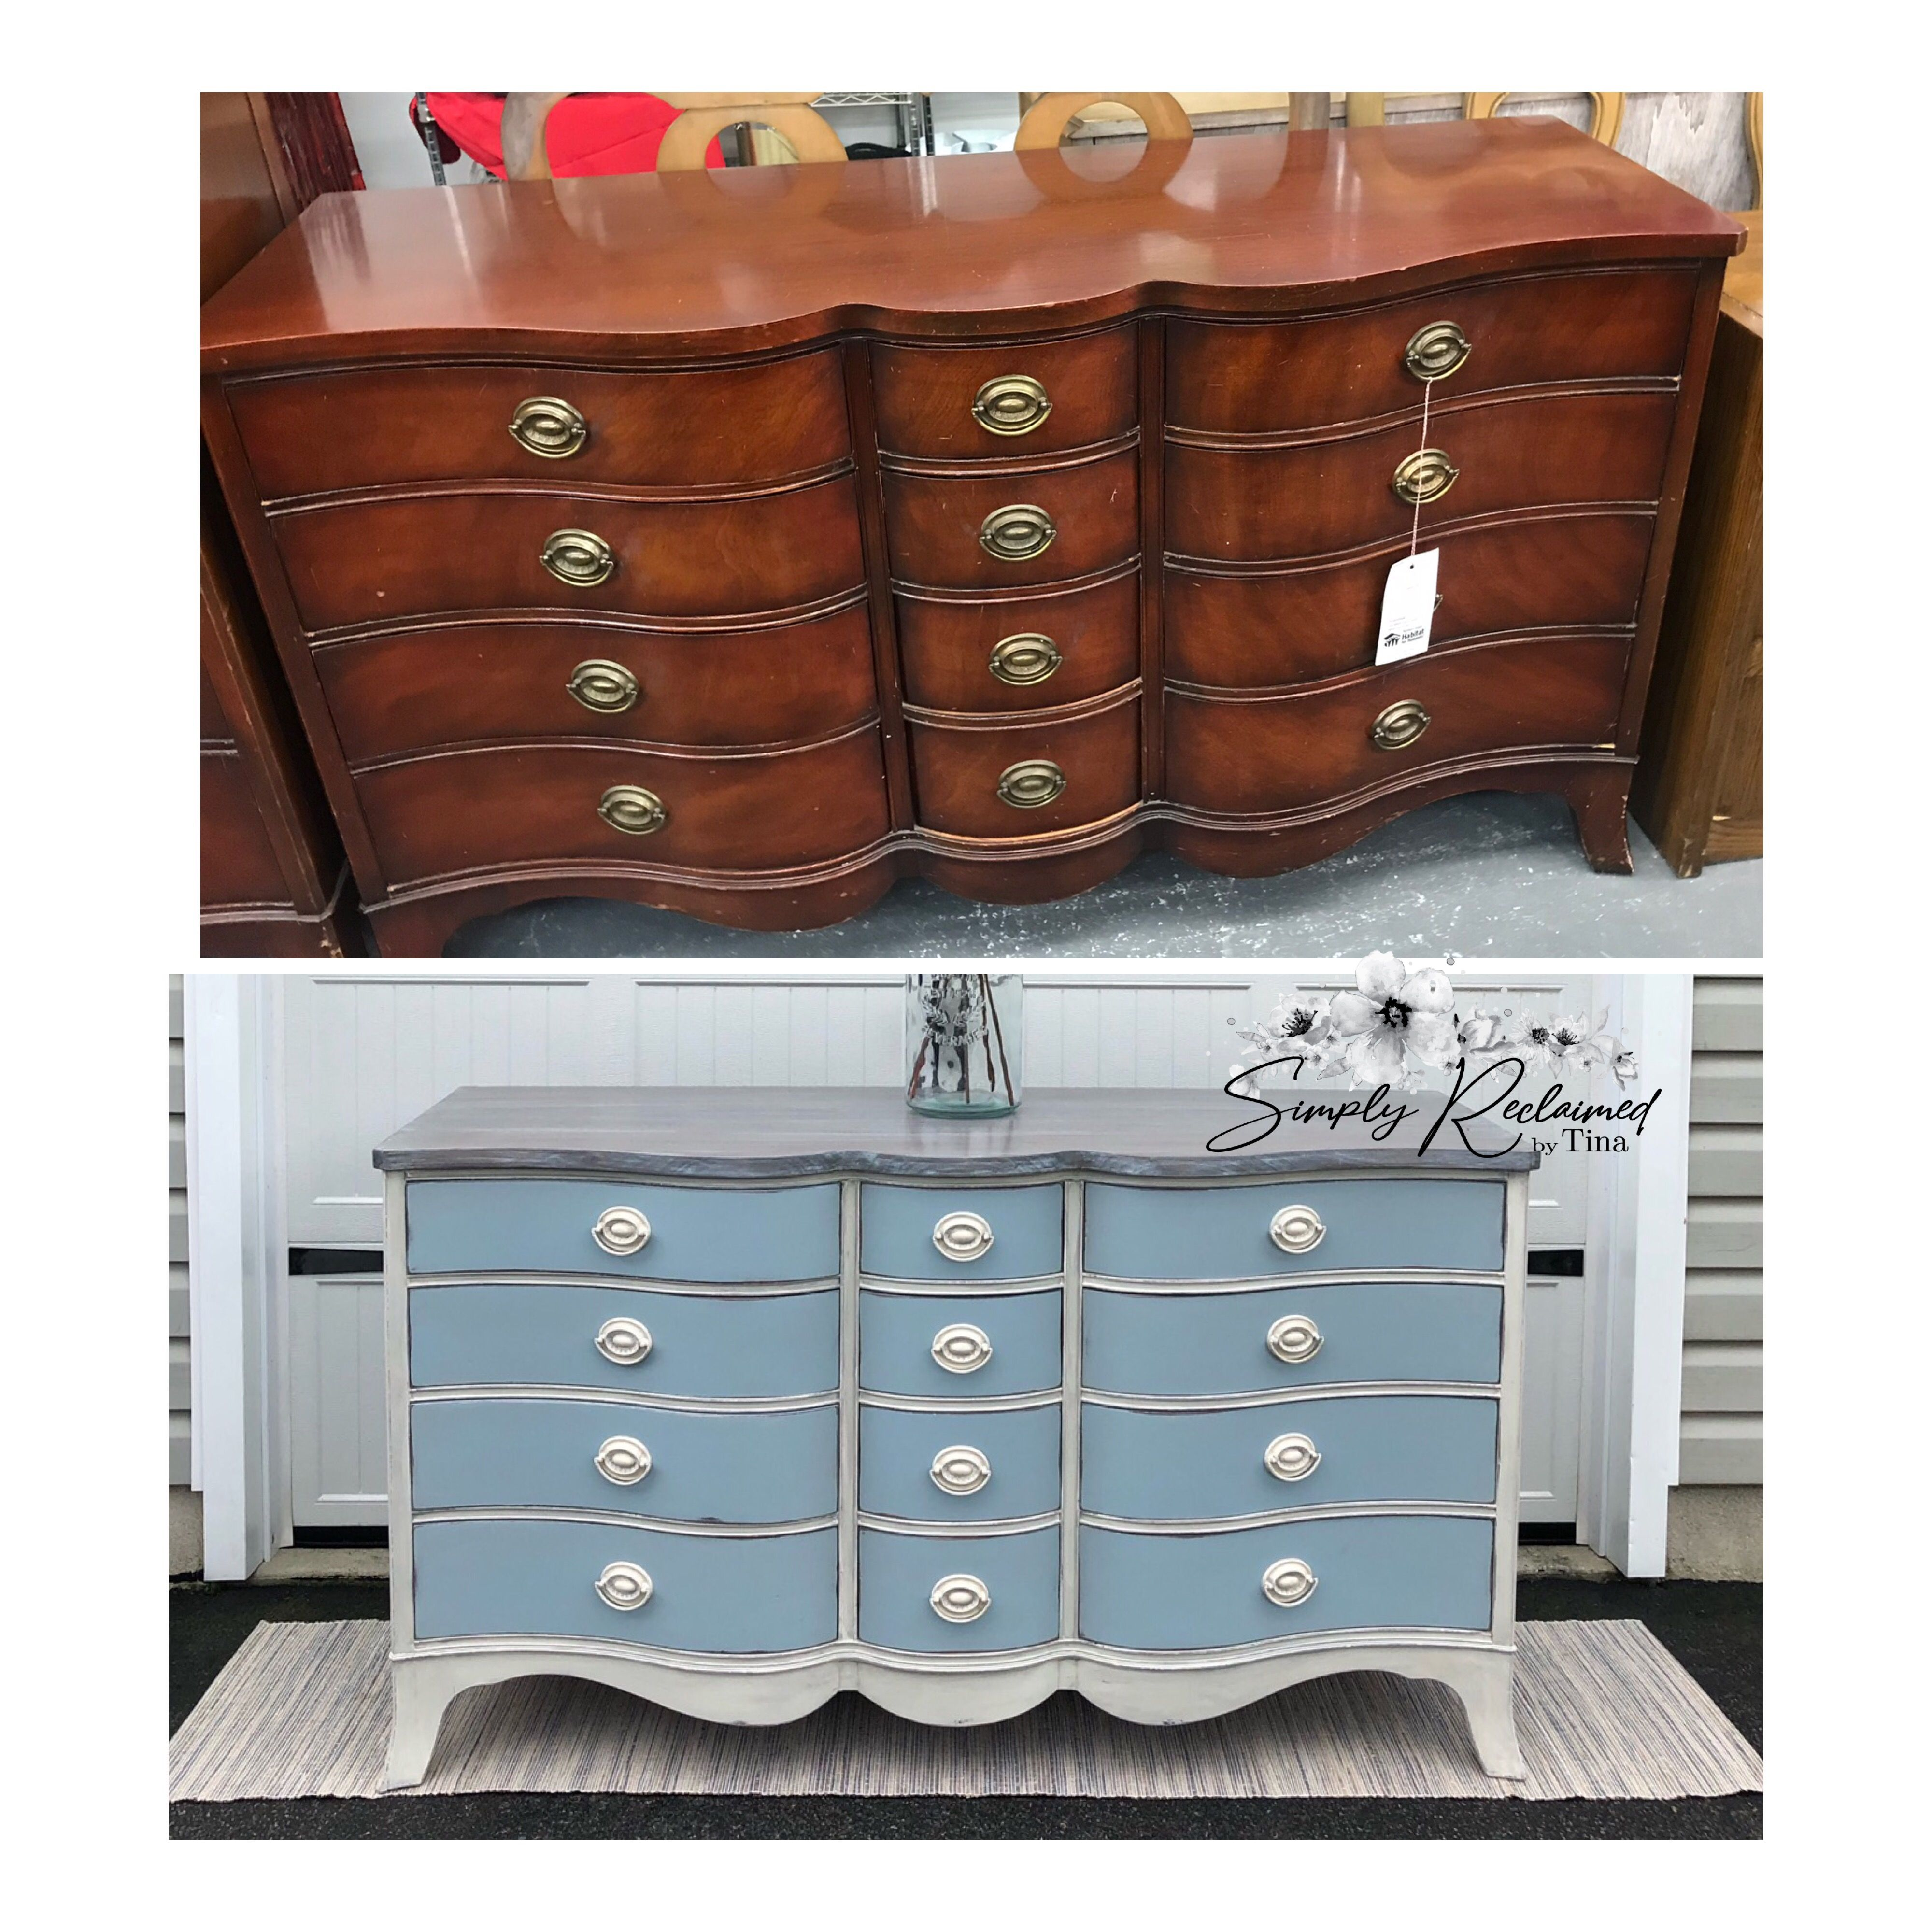 Drexel 12 Drawer Dresser 12 Drawer Dresser Upcycle Dresser Chalk Paint Furniture [ 4000 x 4000 Pixel ]